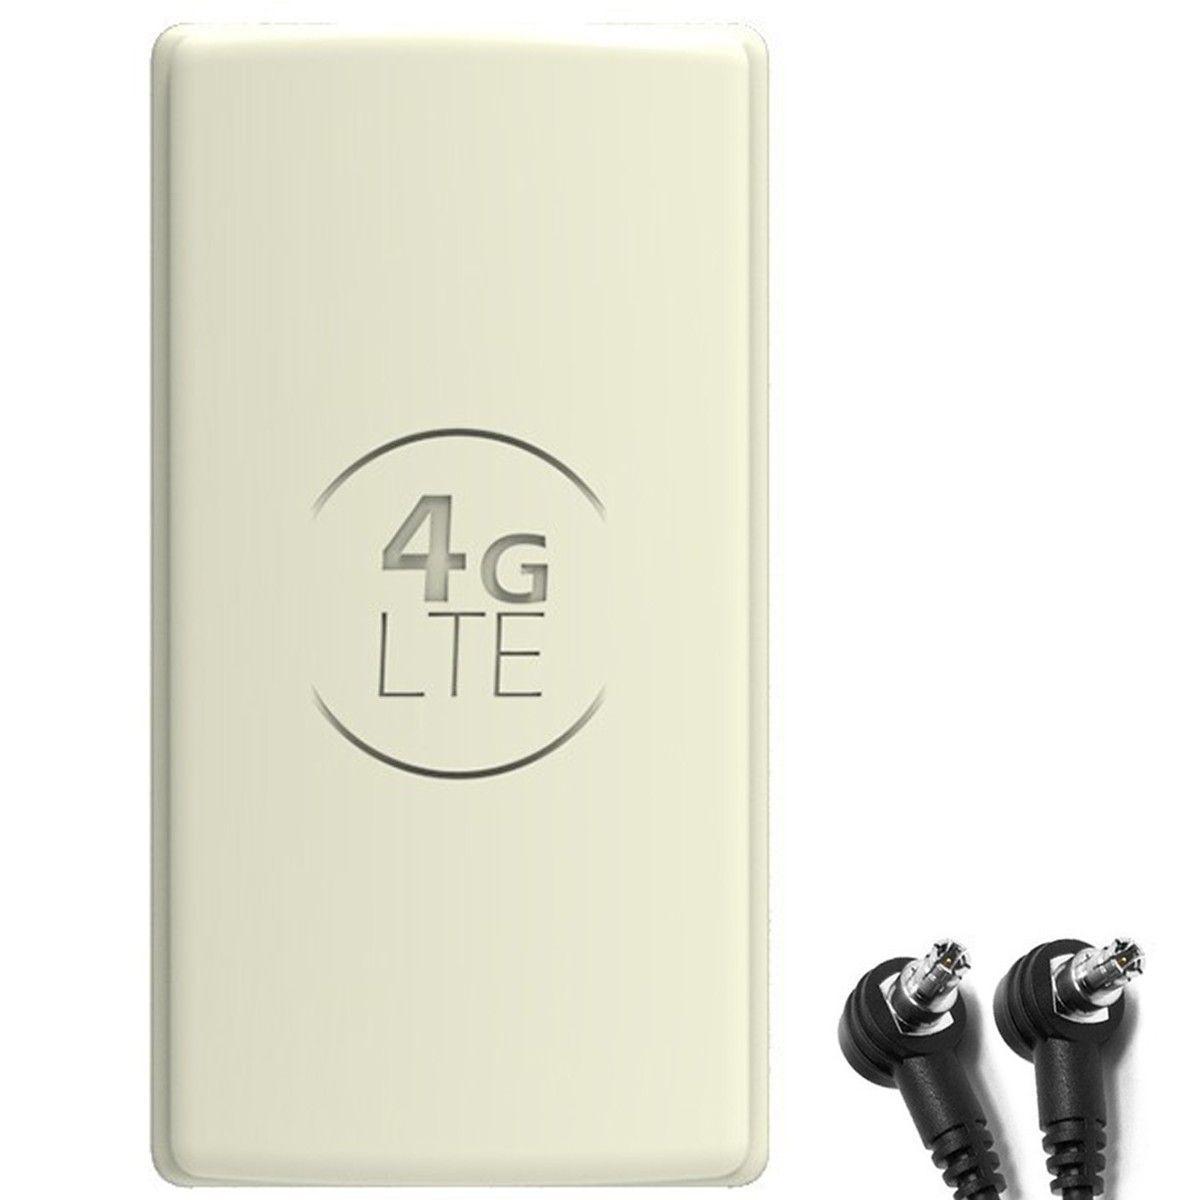 Antena 4G LTE DUAL PANEL 2x25dBi + 2x15m BIAŁA + 2x TS9